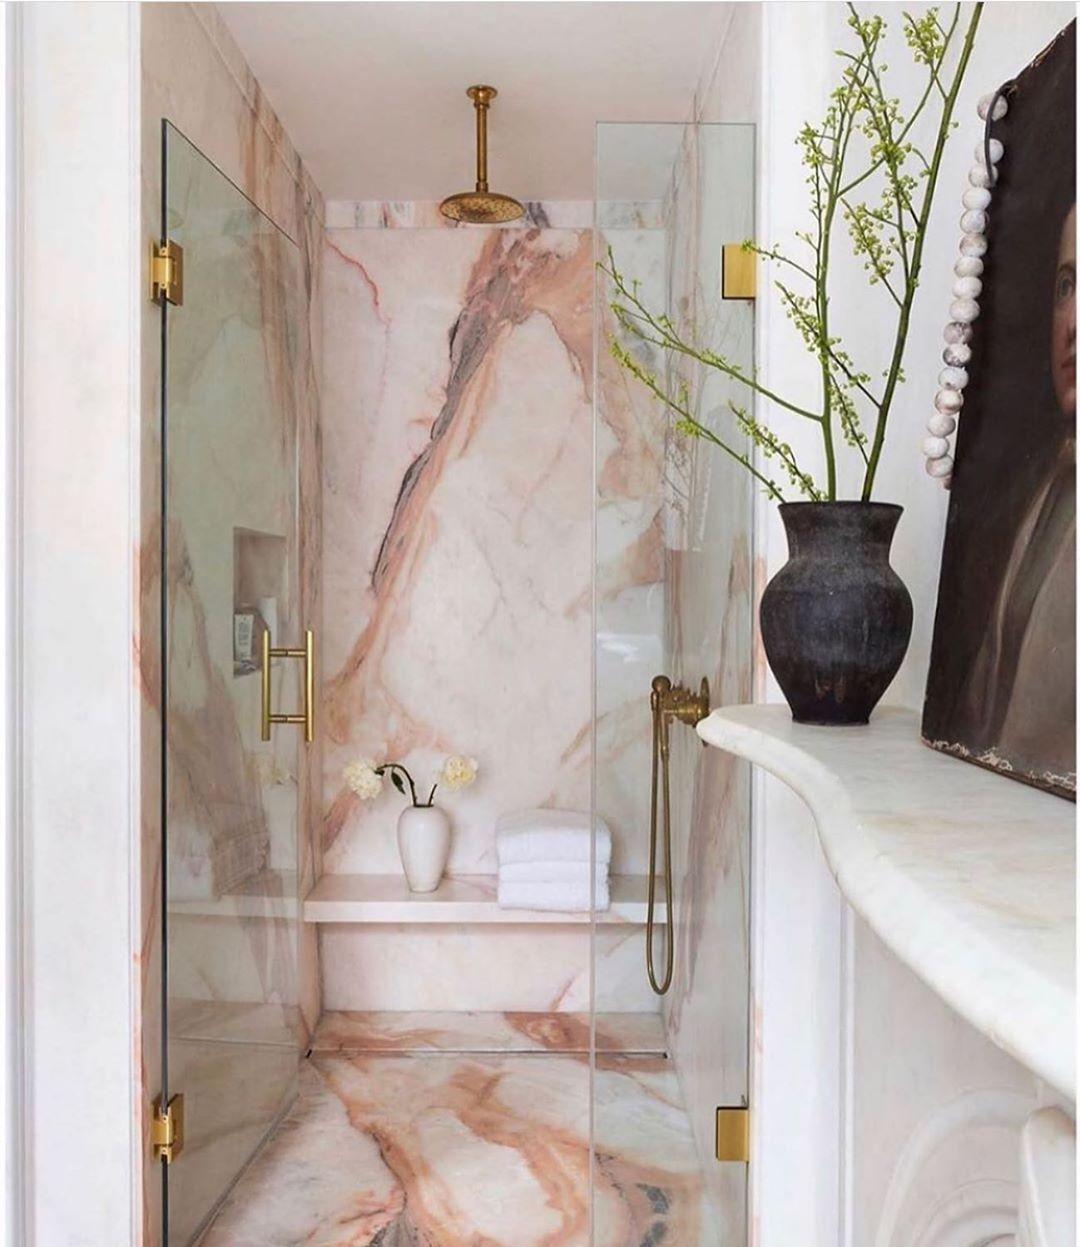 "Bathrooms of Instagram on Instagram: ""Speechless 😍. By ..."